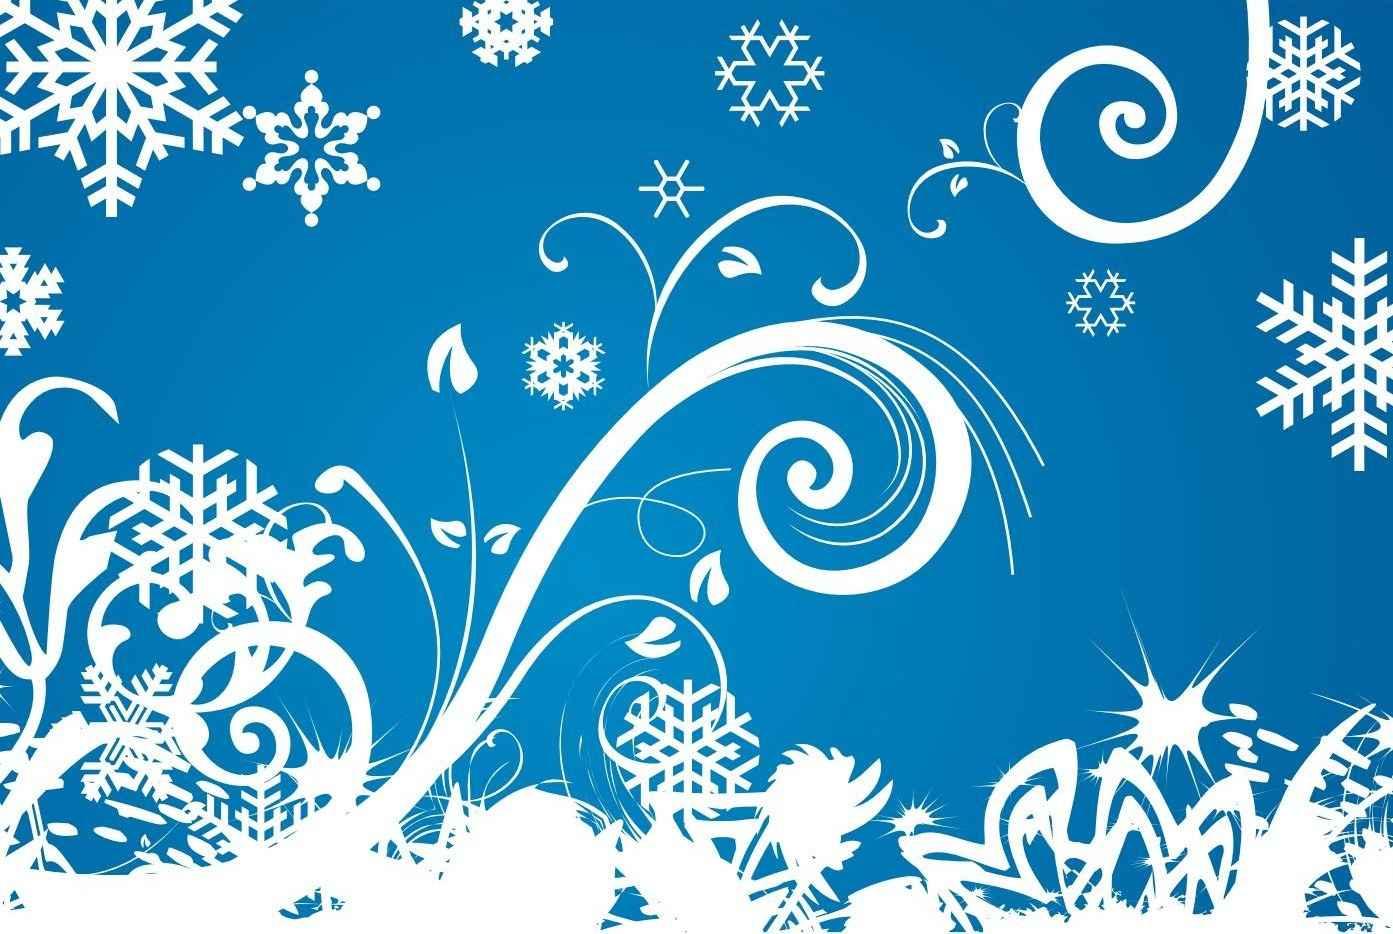 Winter Swirls